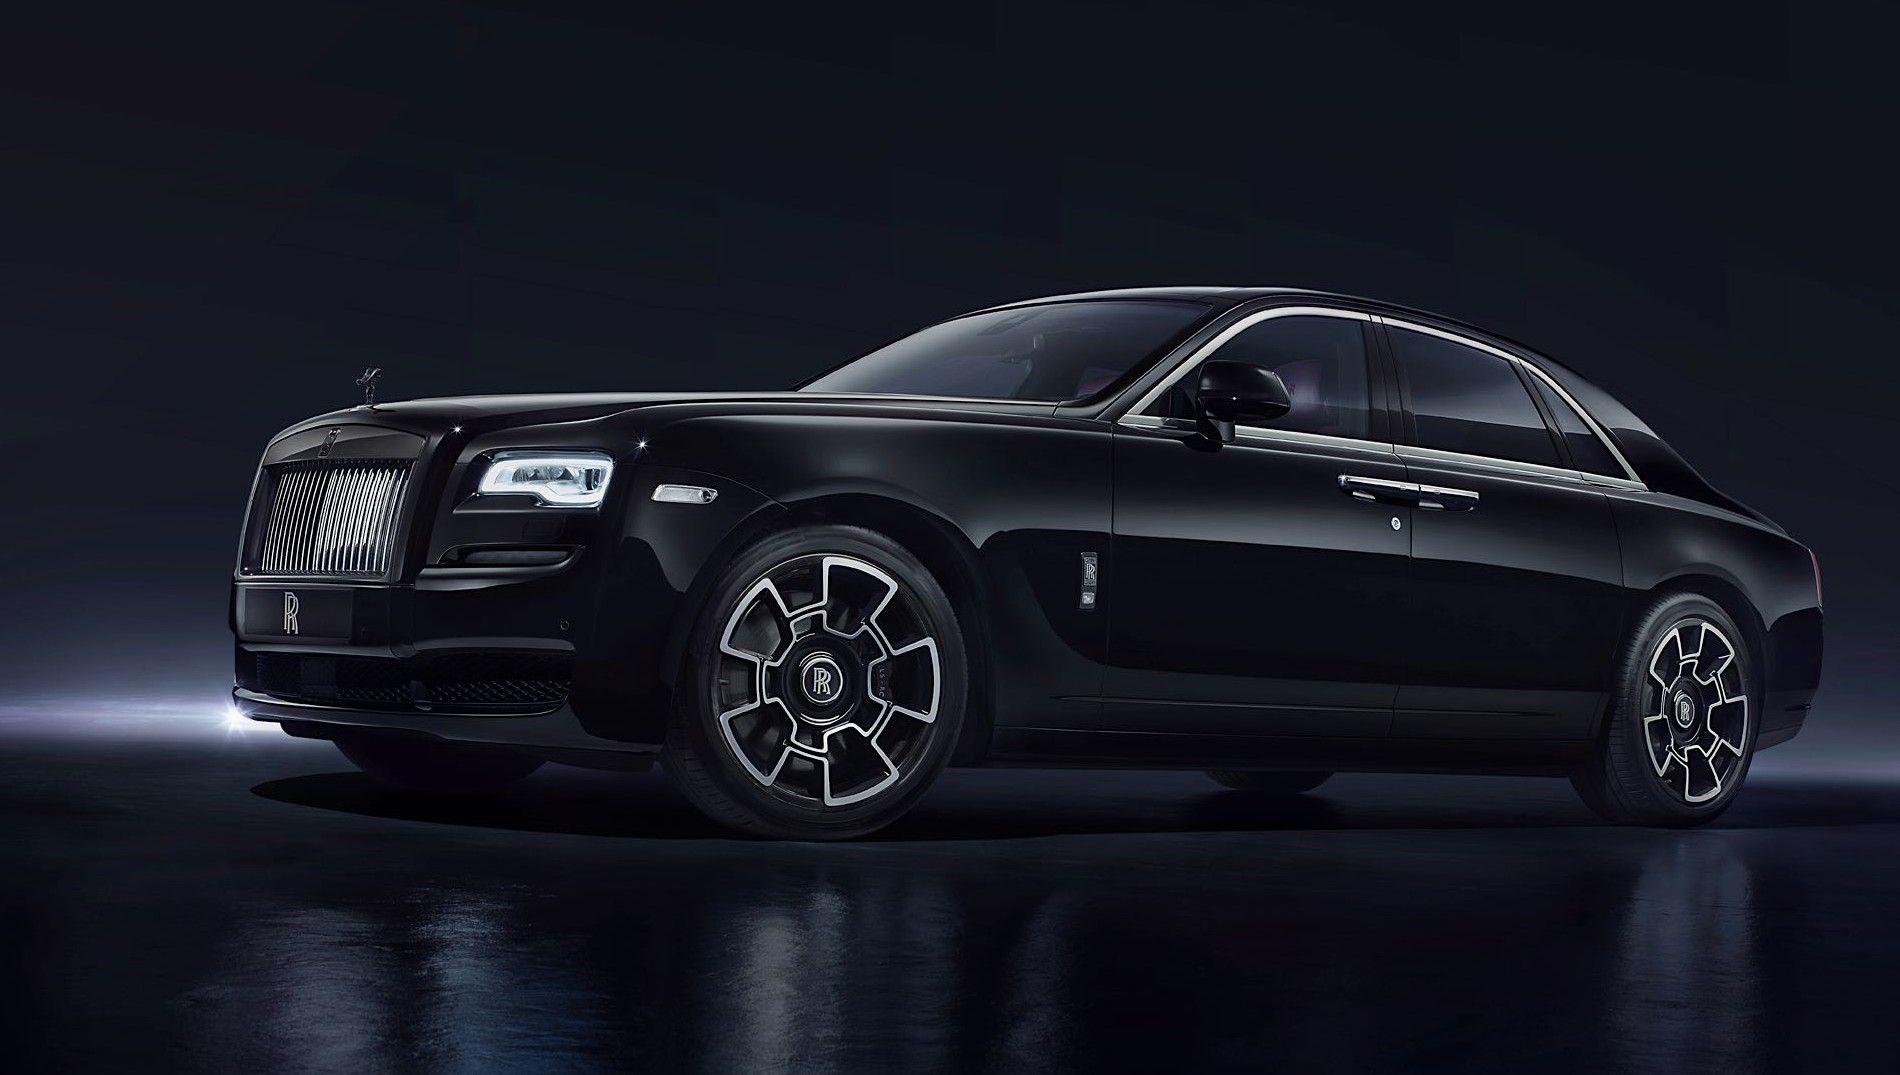 Black Badge' by Rolls-Royce | Rolls royce ghost black ...